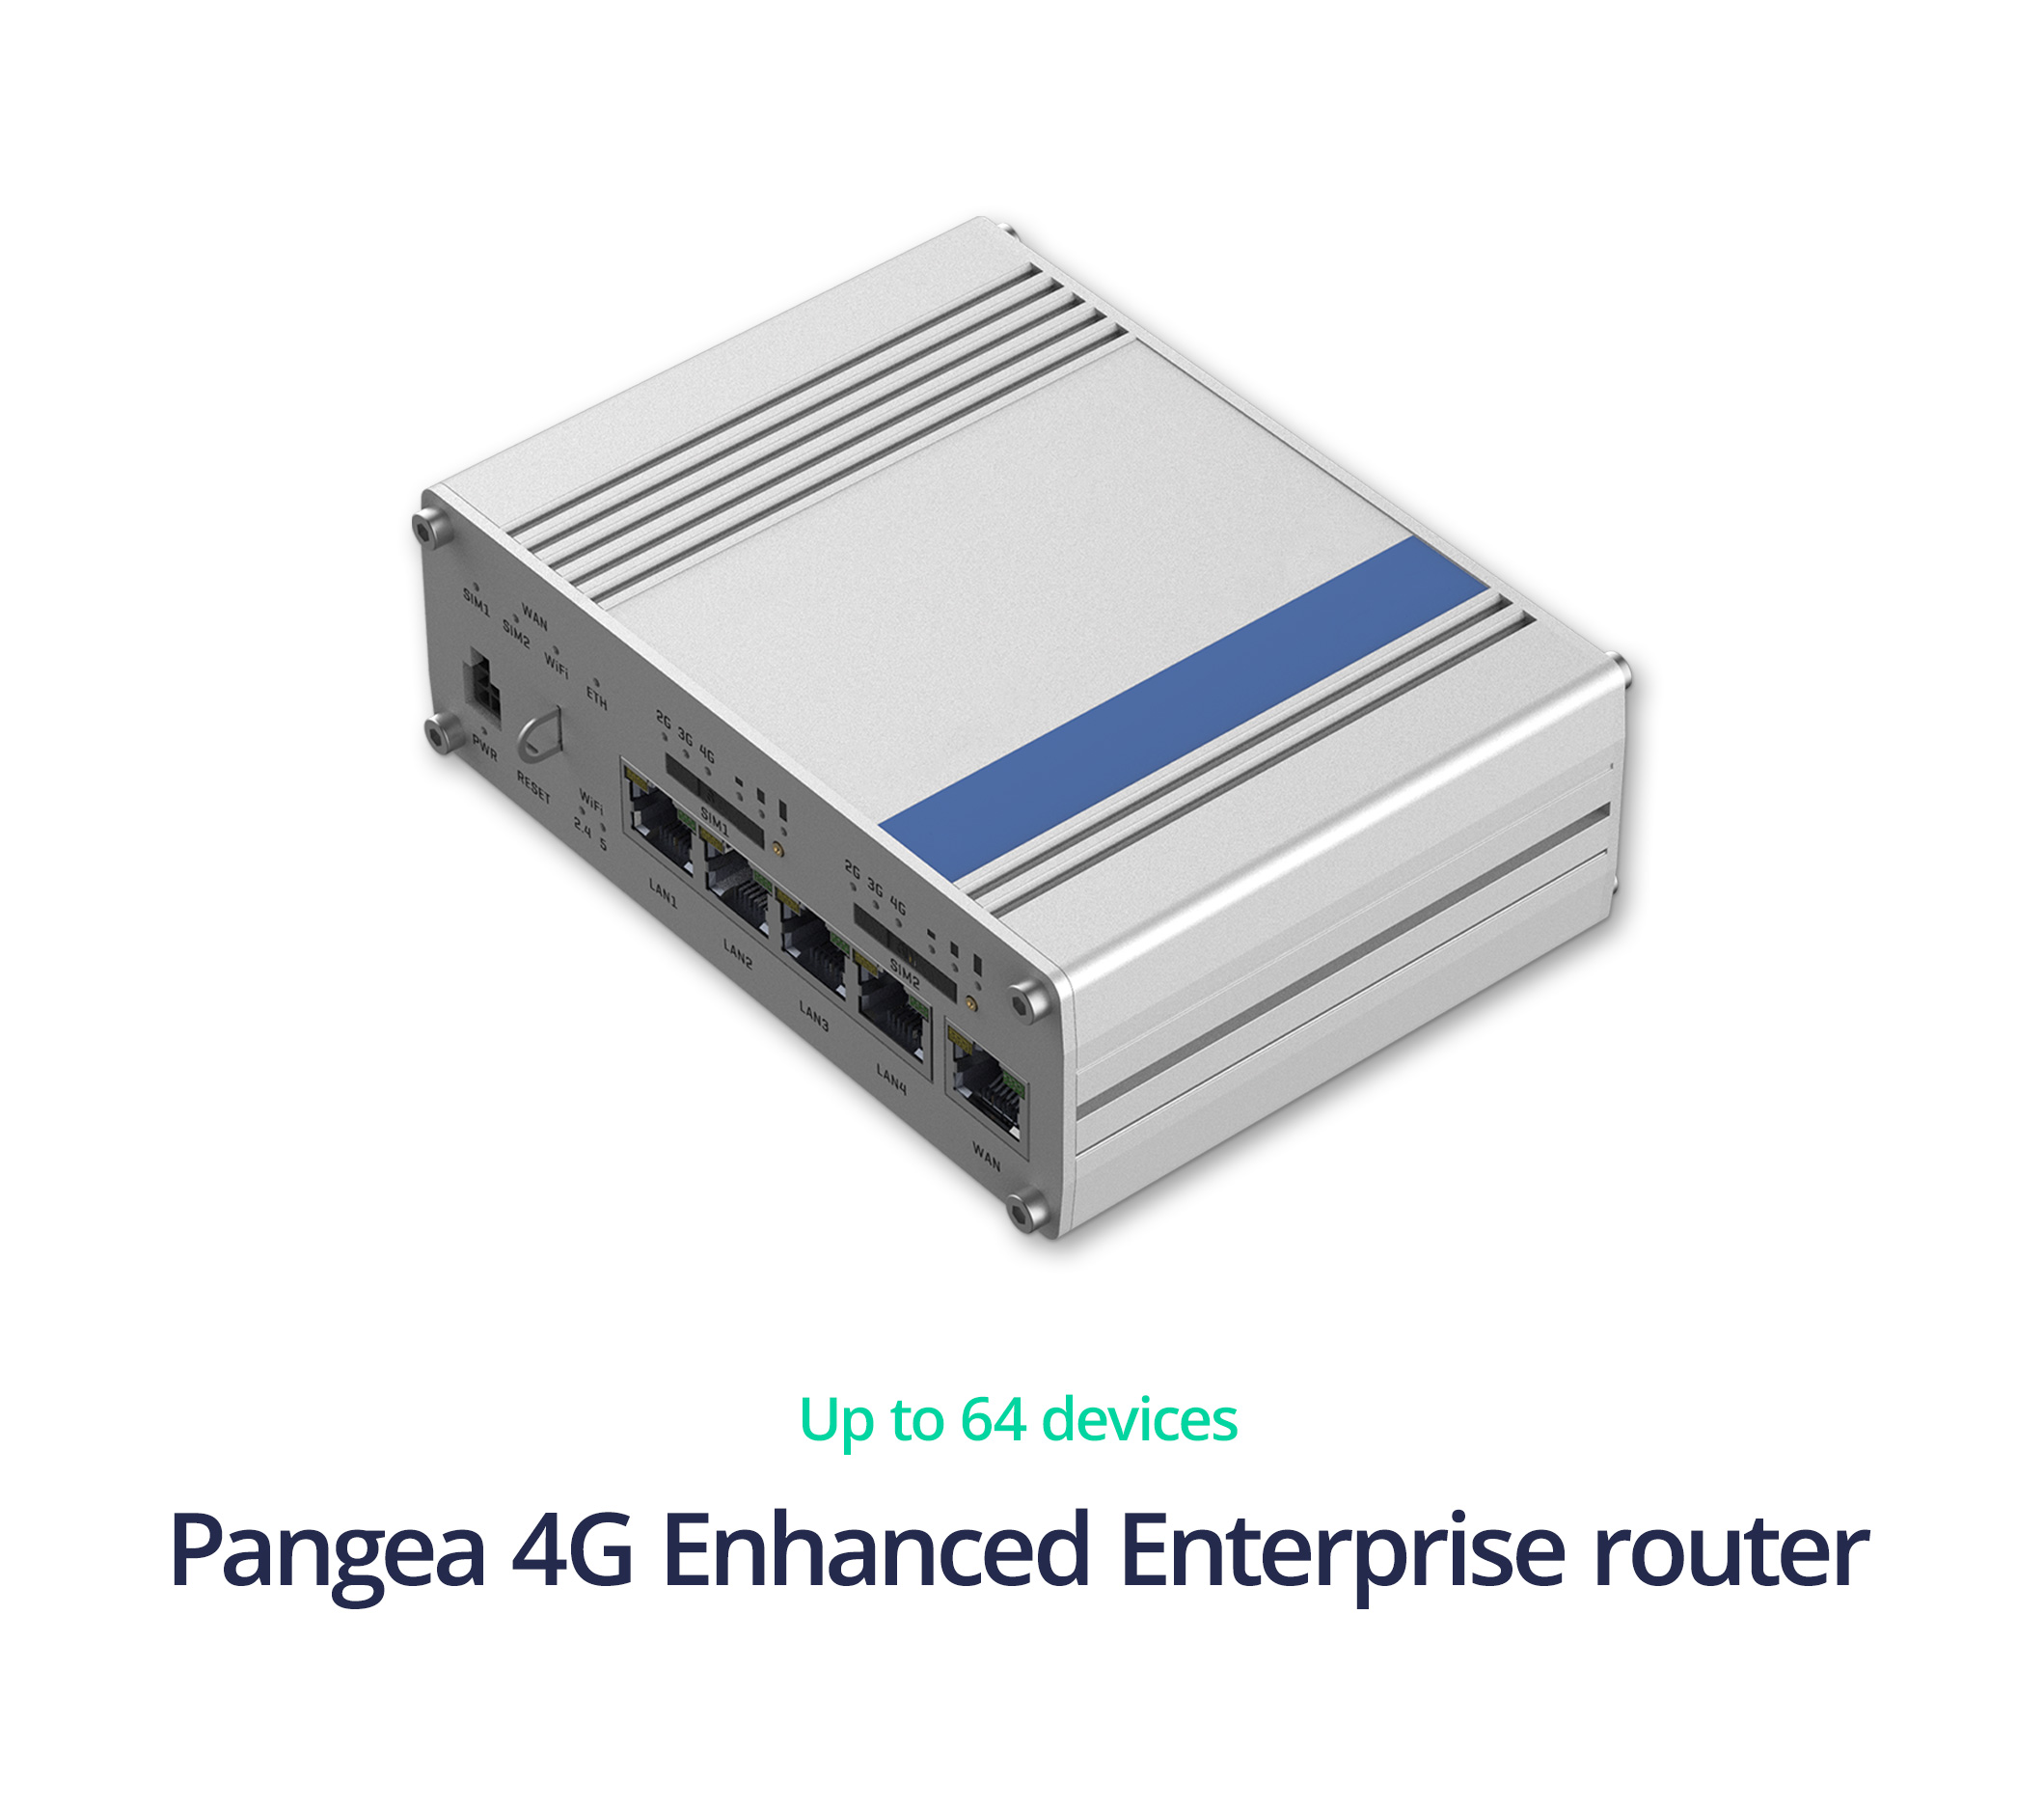 Pangea 4G Bonded router - Pangea 4G Enhanced Enterprise link